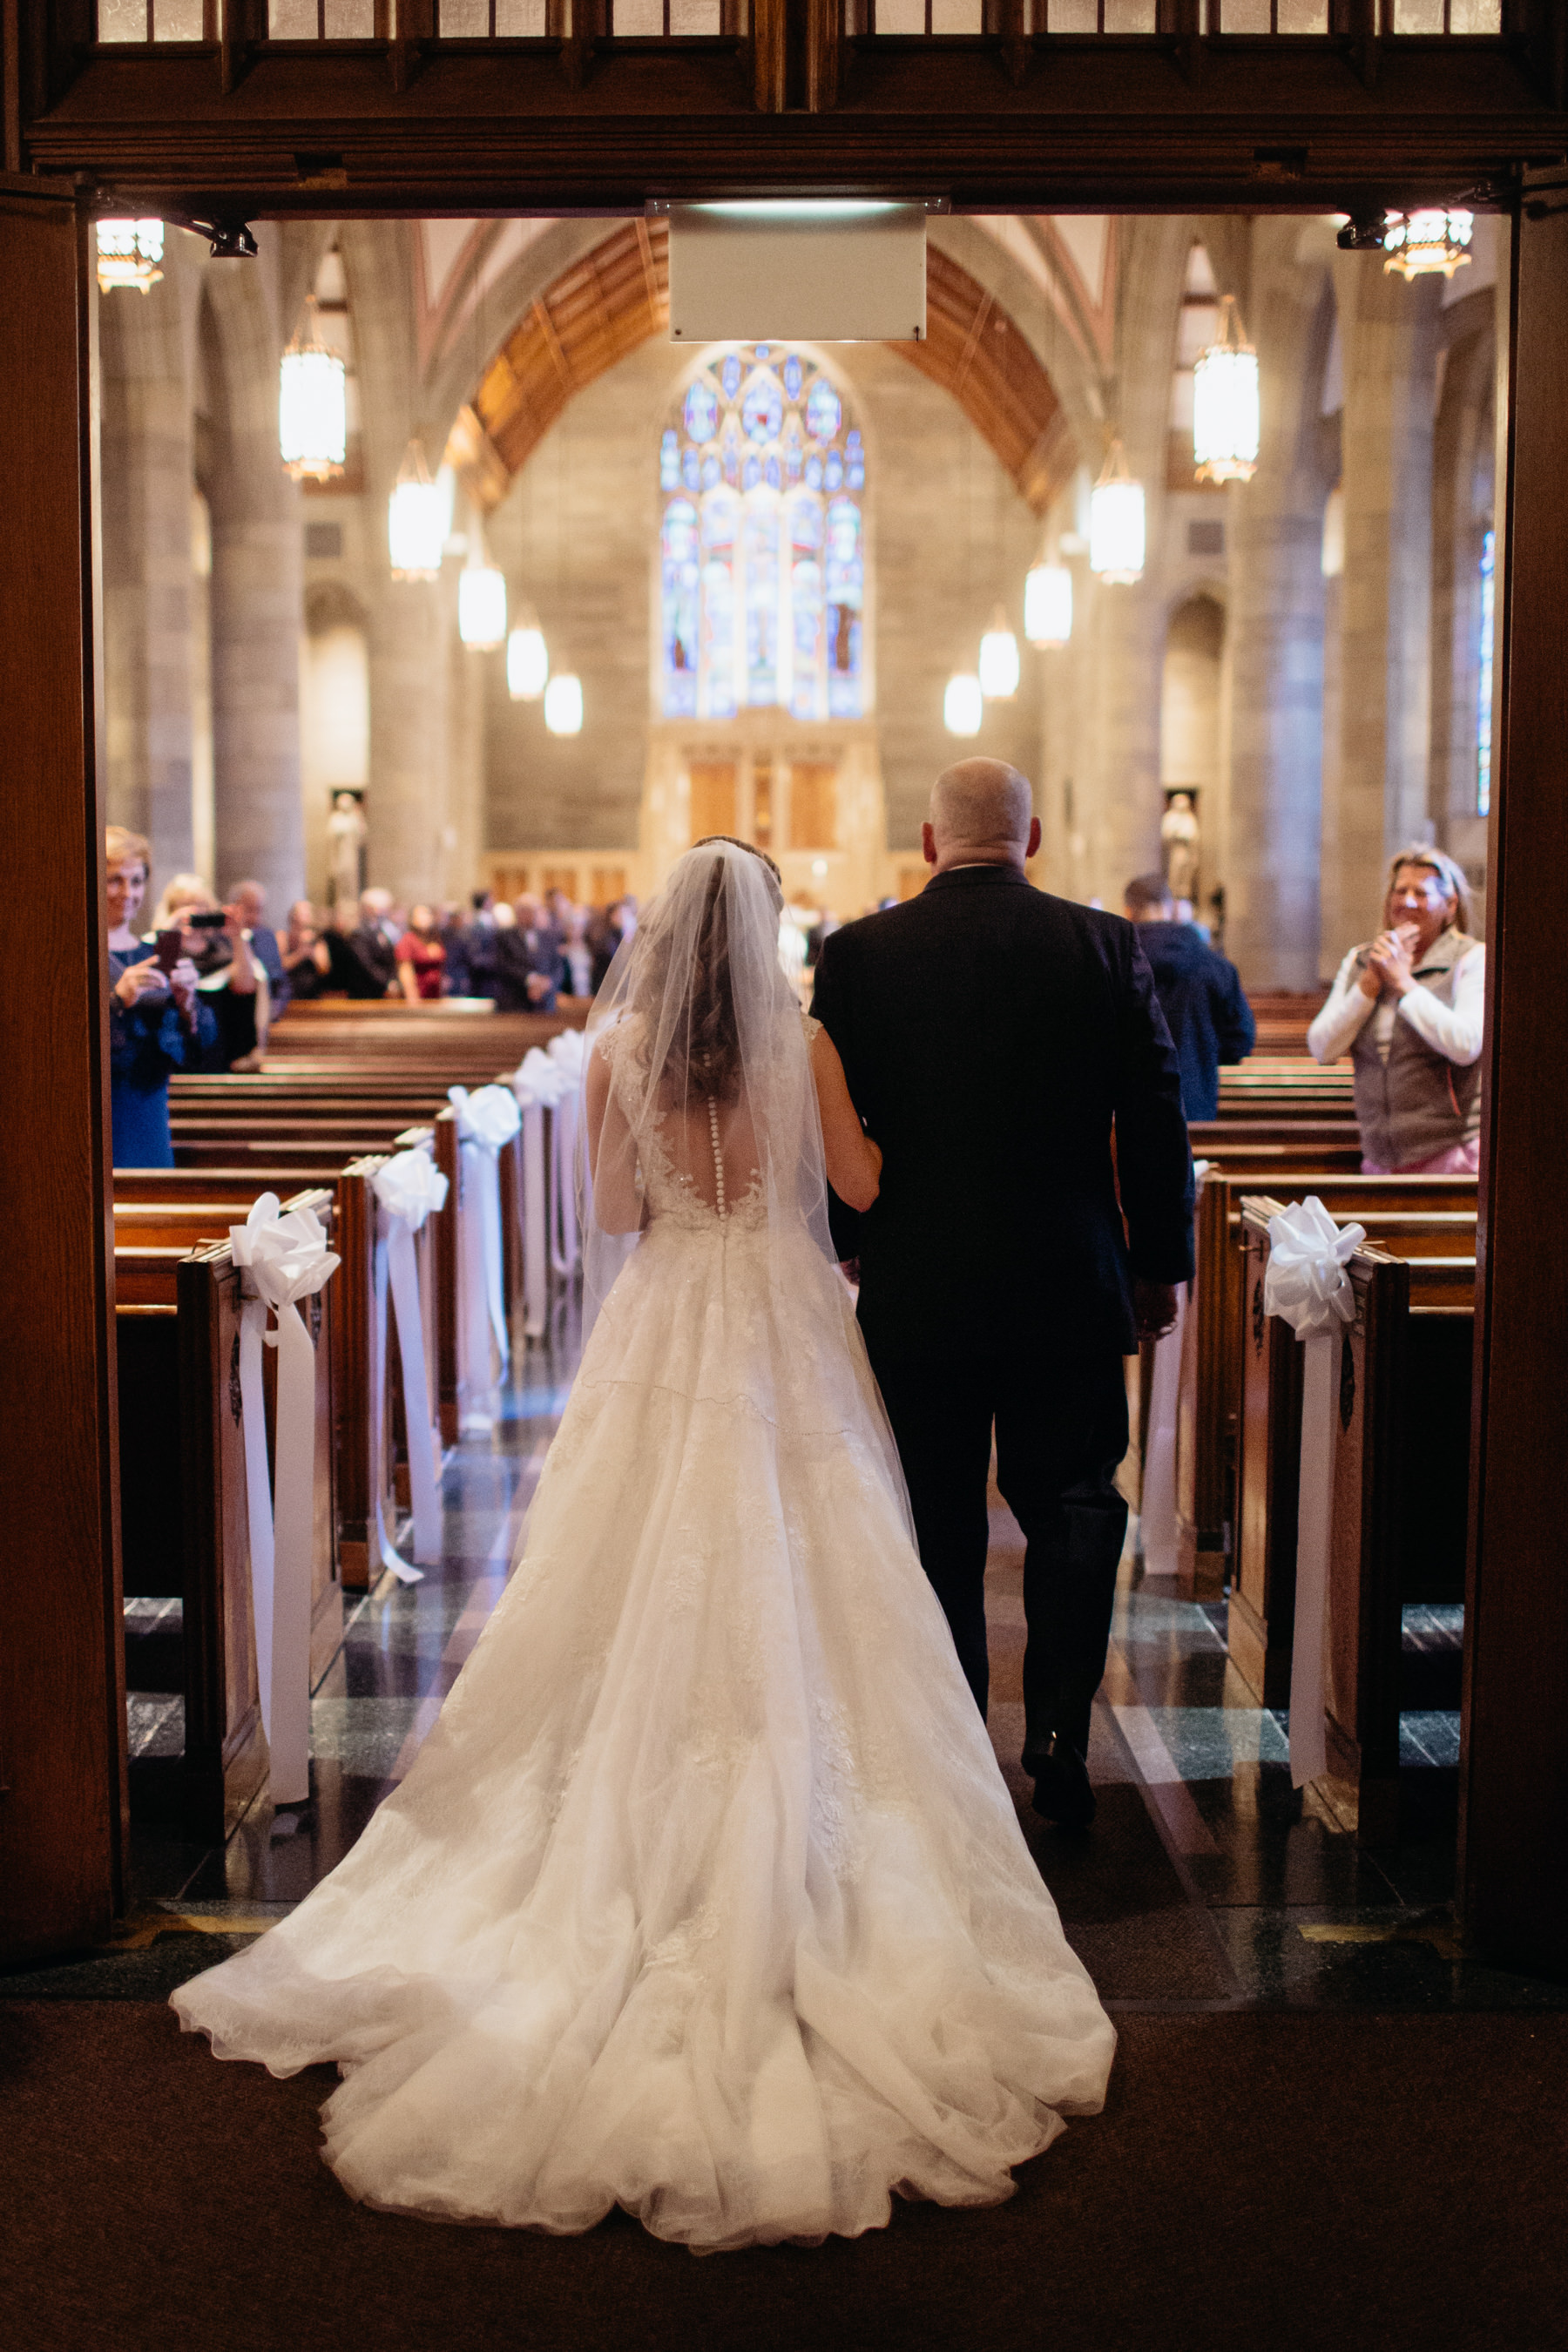 Quincy Ma Massachusetts Wedding Dedham Boston Granie Links Wedding New England Catholic Cathedral Liz Osban Photography 35.jpg